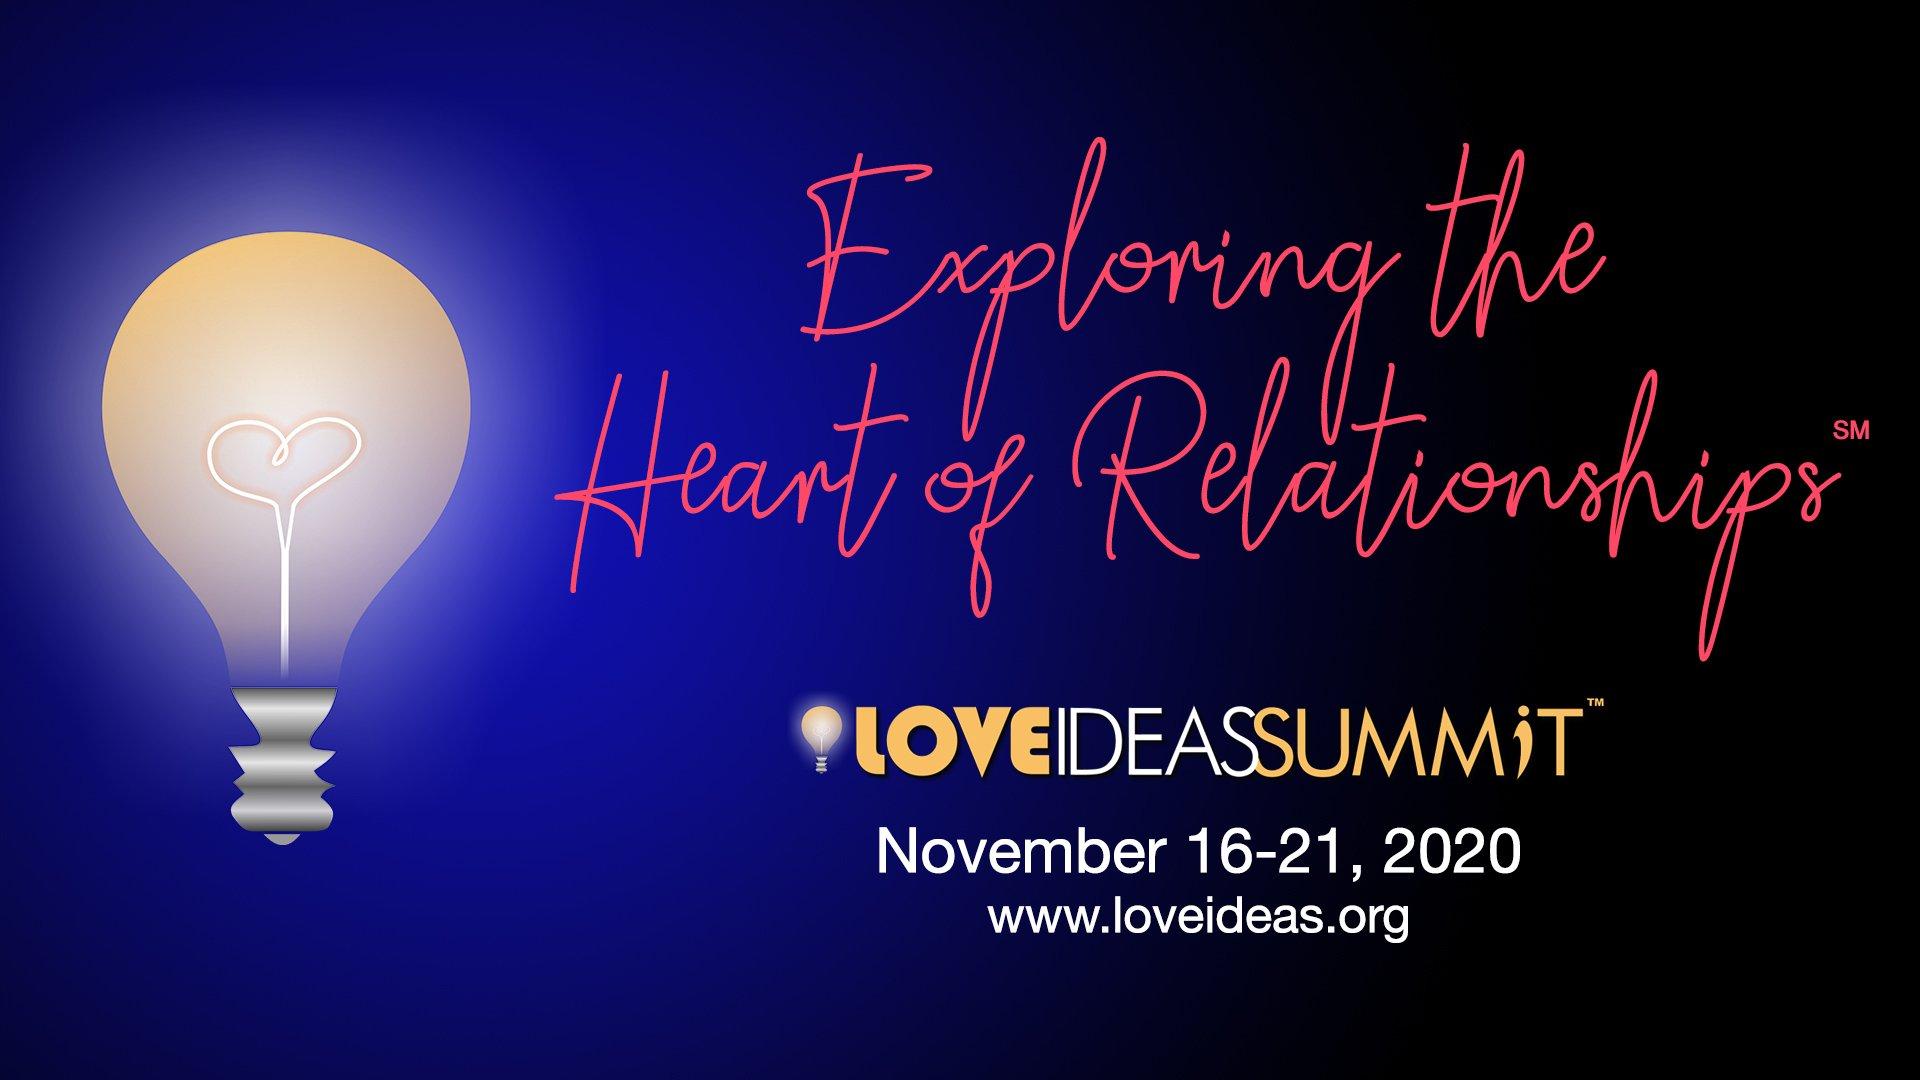 Love IDEAS Summit Nov 16 -21 2020 - Invisible Disabilities Association